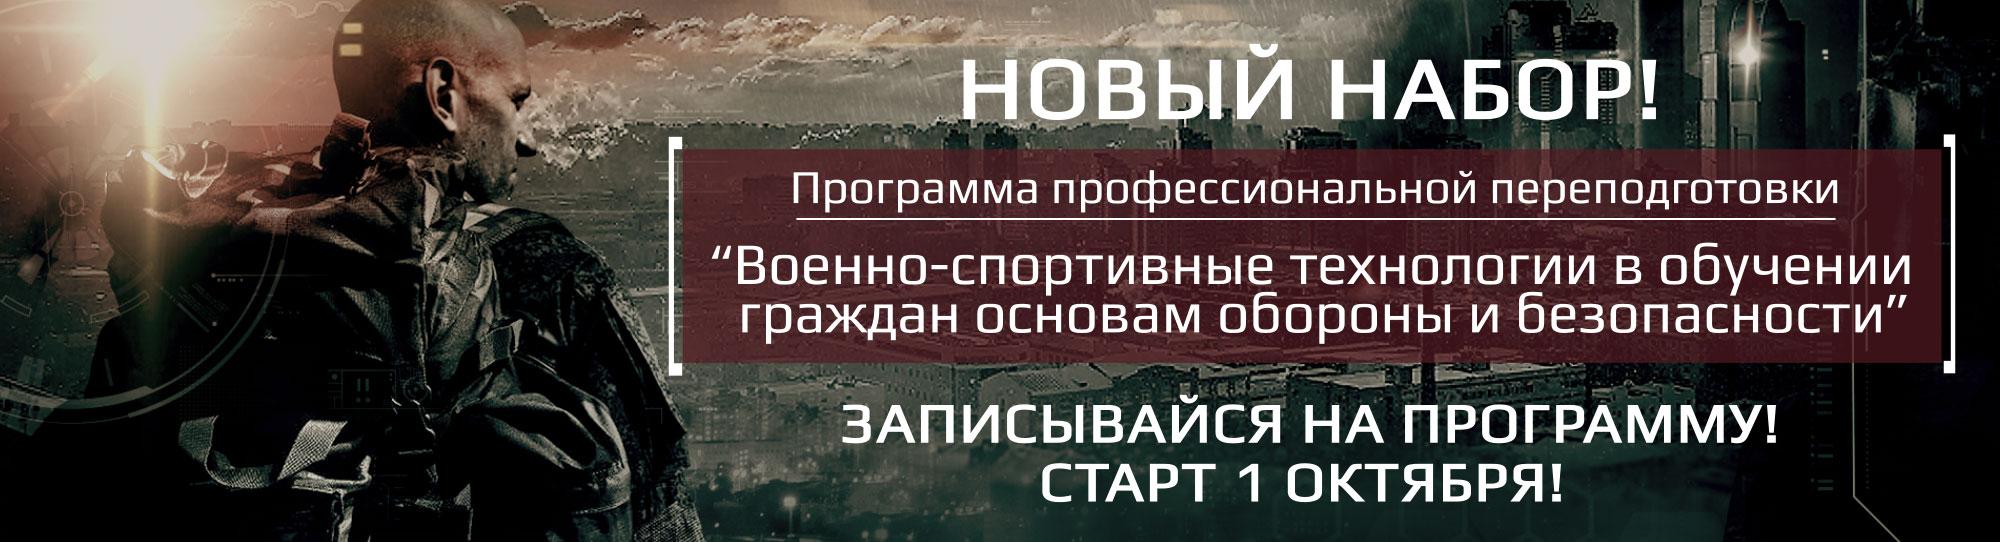 САЙТ МПГУ (новый)_1_00000